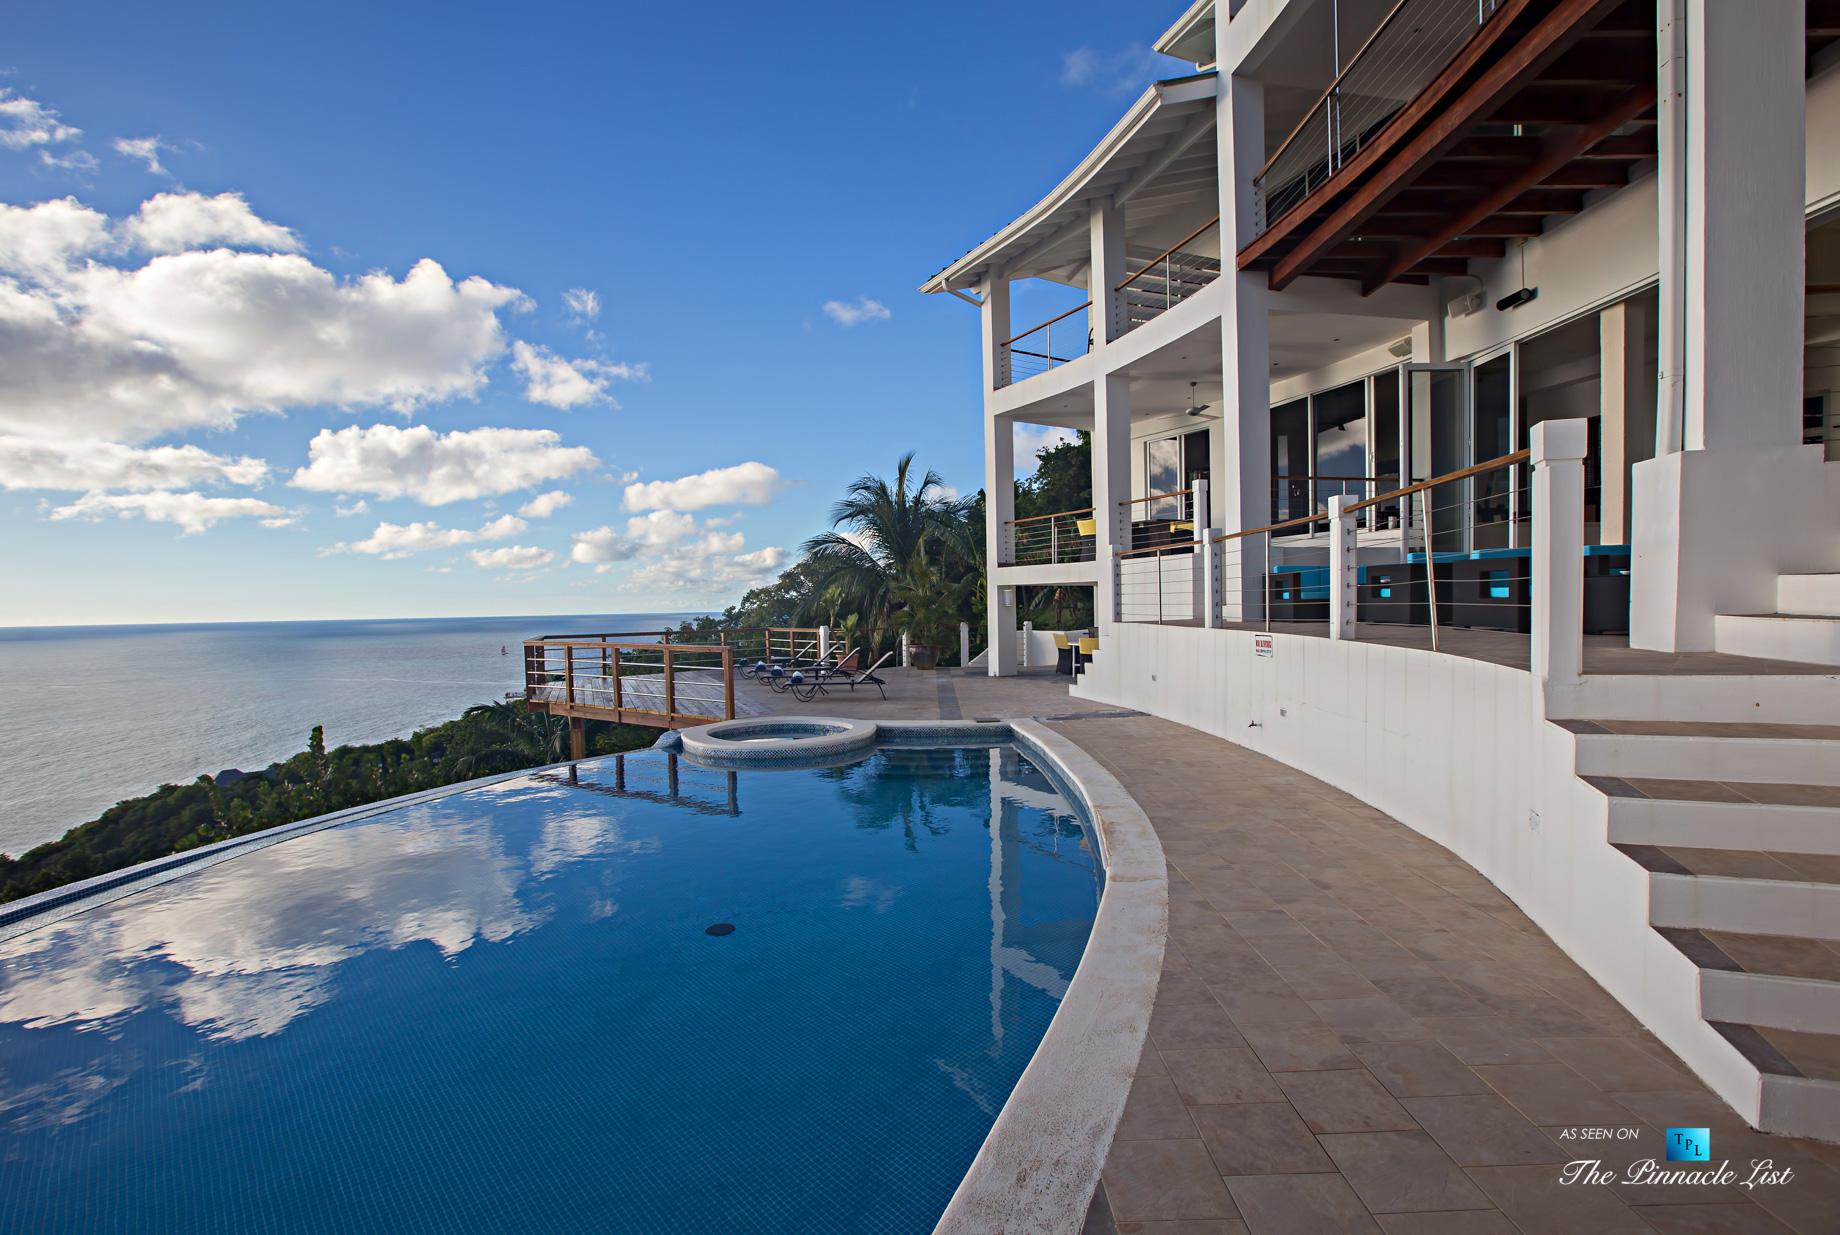 Akasha Luxury Caribbean Villa - Cap Estate, St. Lucia